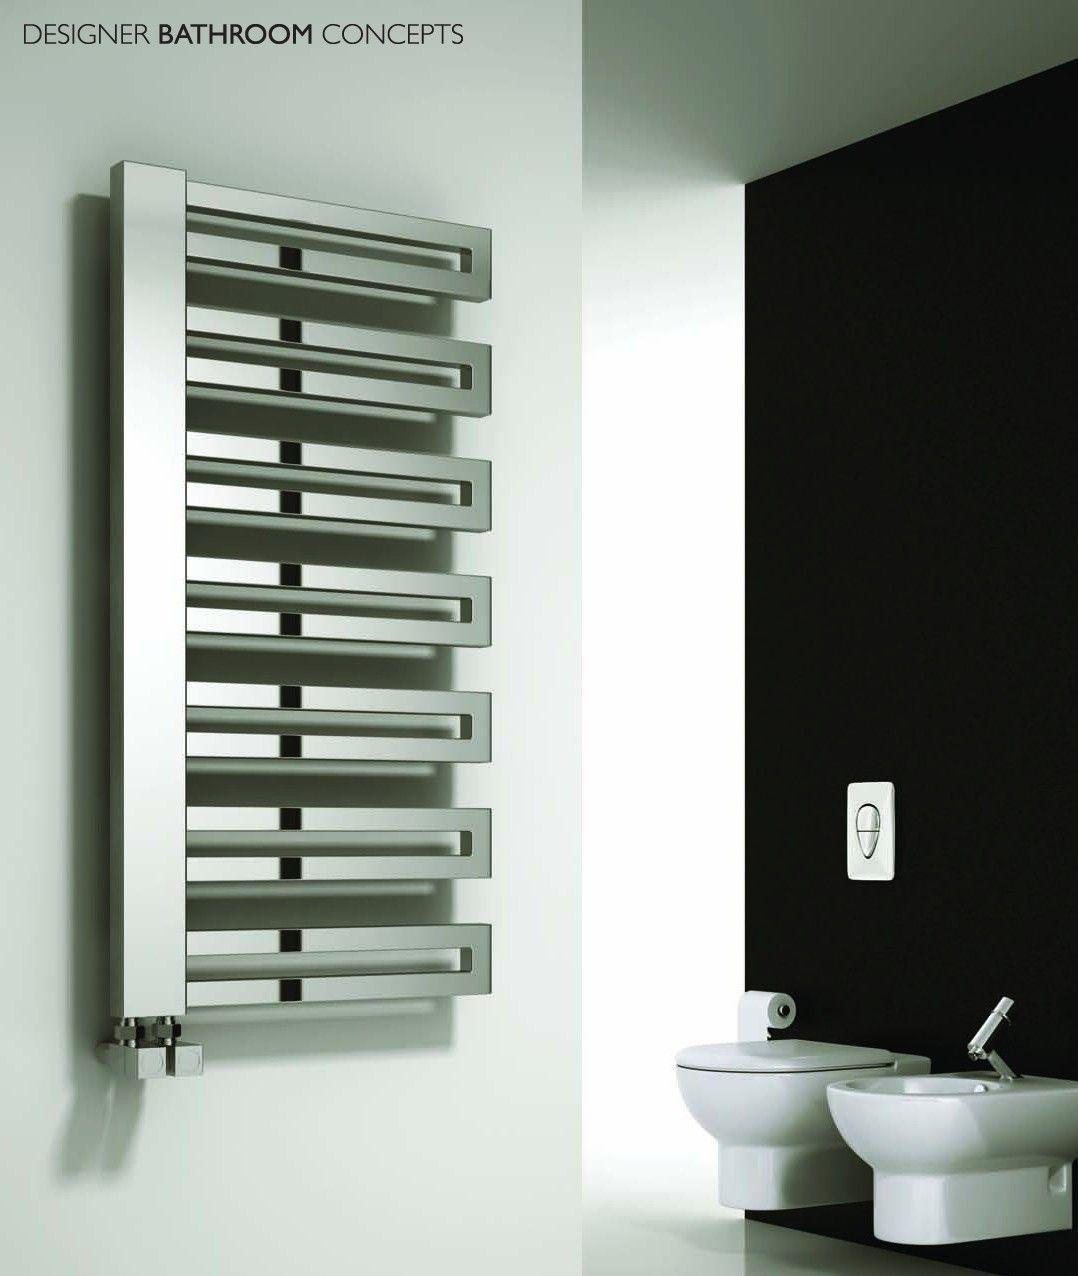 Designer heated towel rails for bathrooms - Ginosa Designer Heated Towel Rails From Designerbathroomconcepts Com